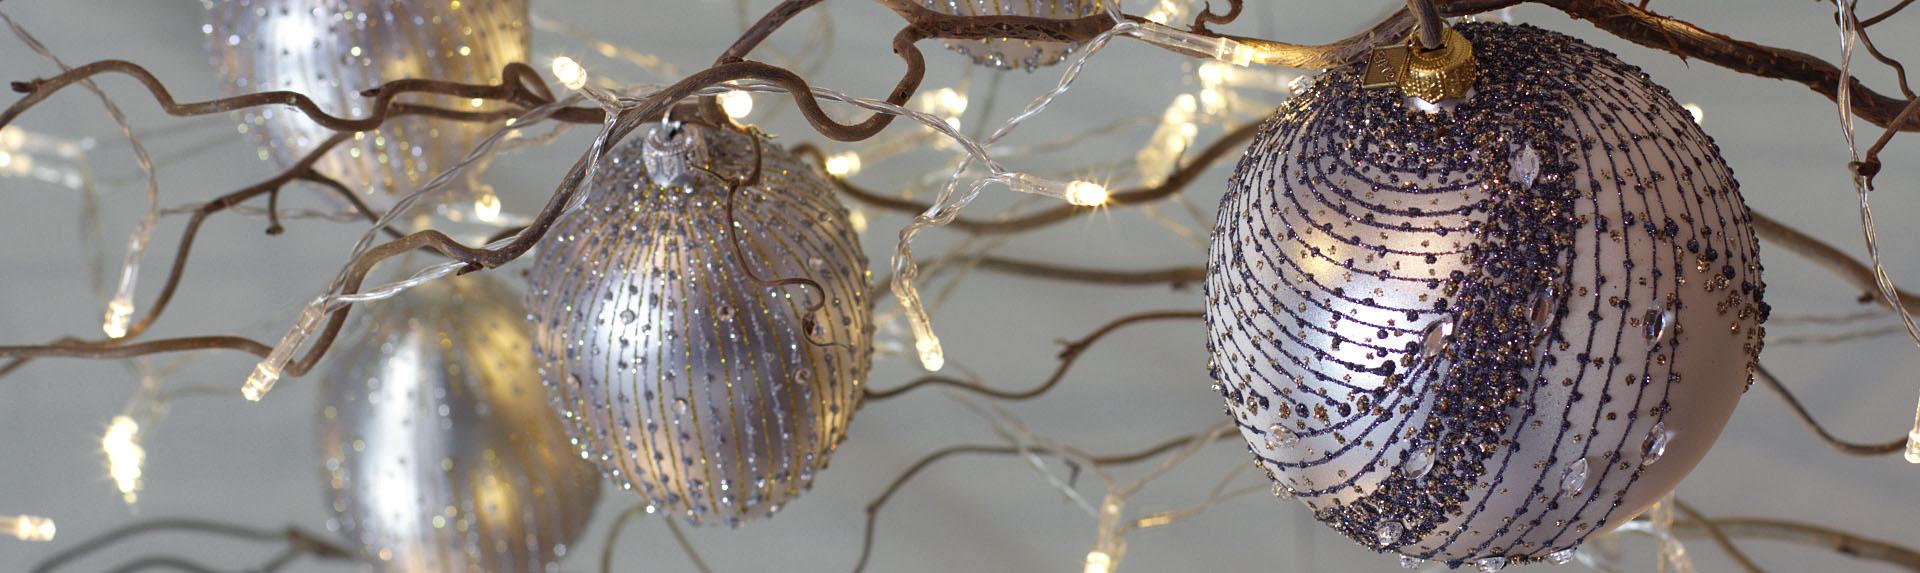 Christbaumkugeln Polen.Exarte Weihnachtsschmuck Weihnachtskugeln Und Christbaumfiguren